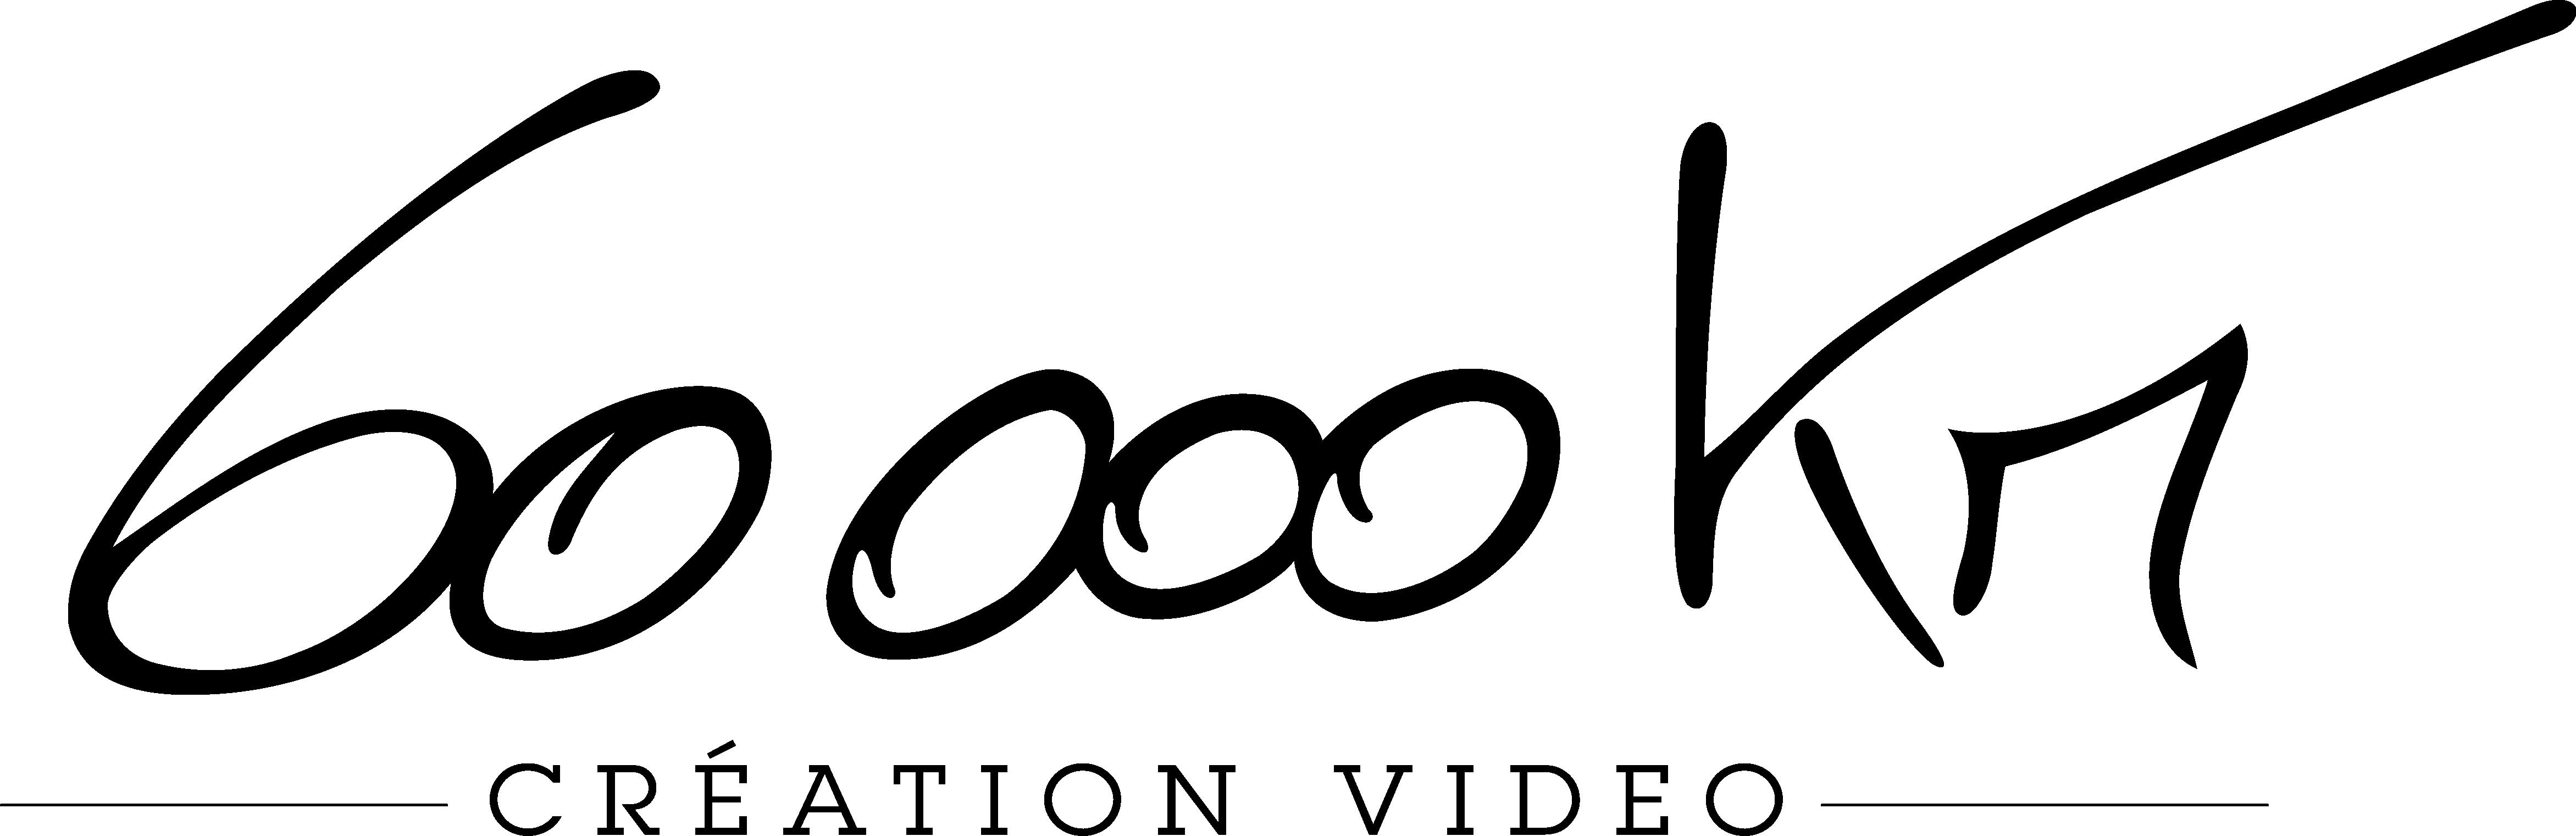 logo noir 6000km